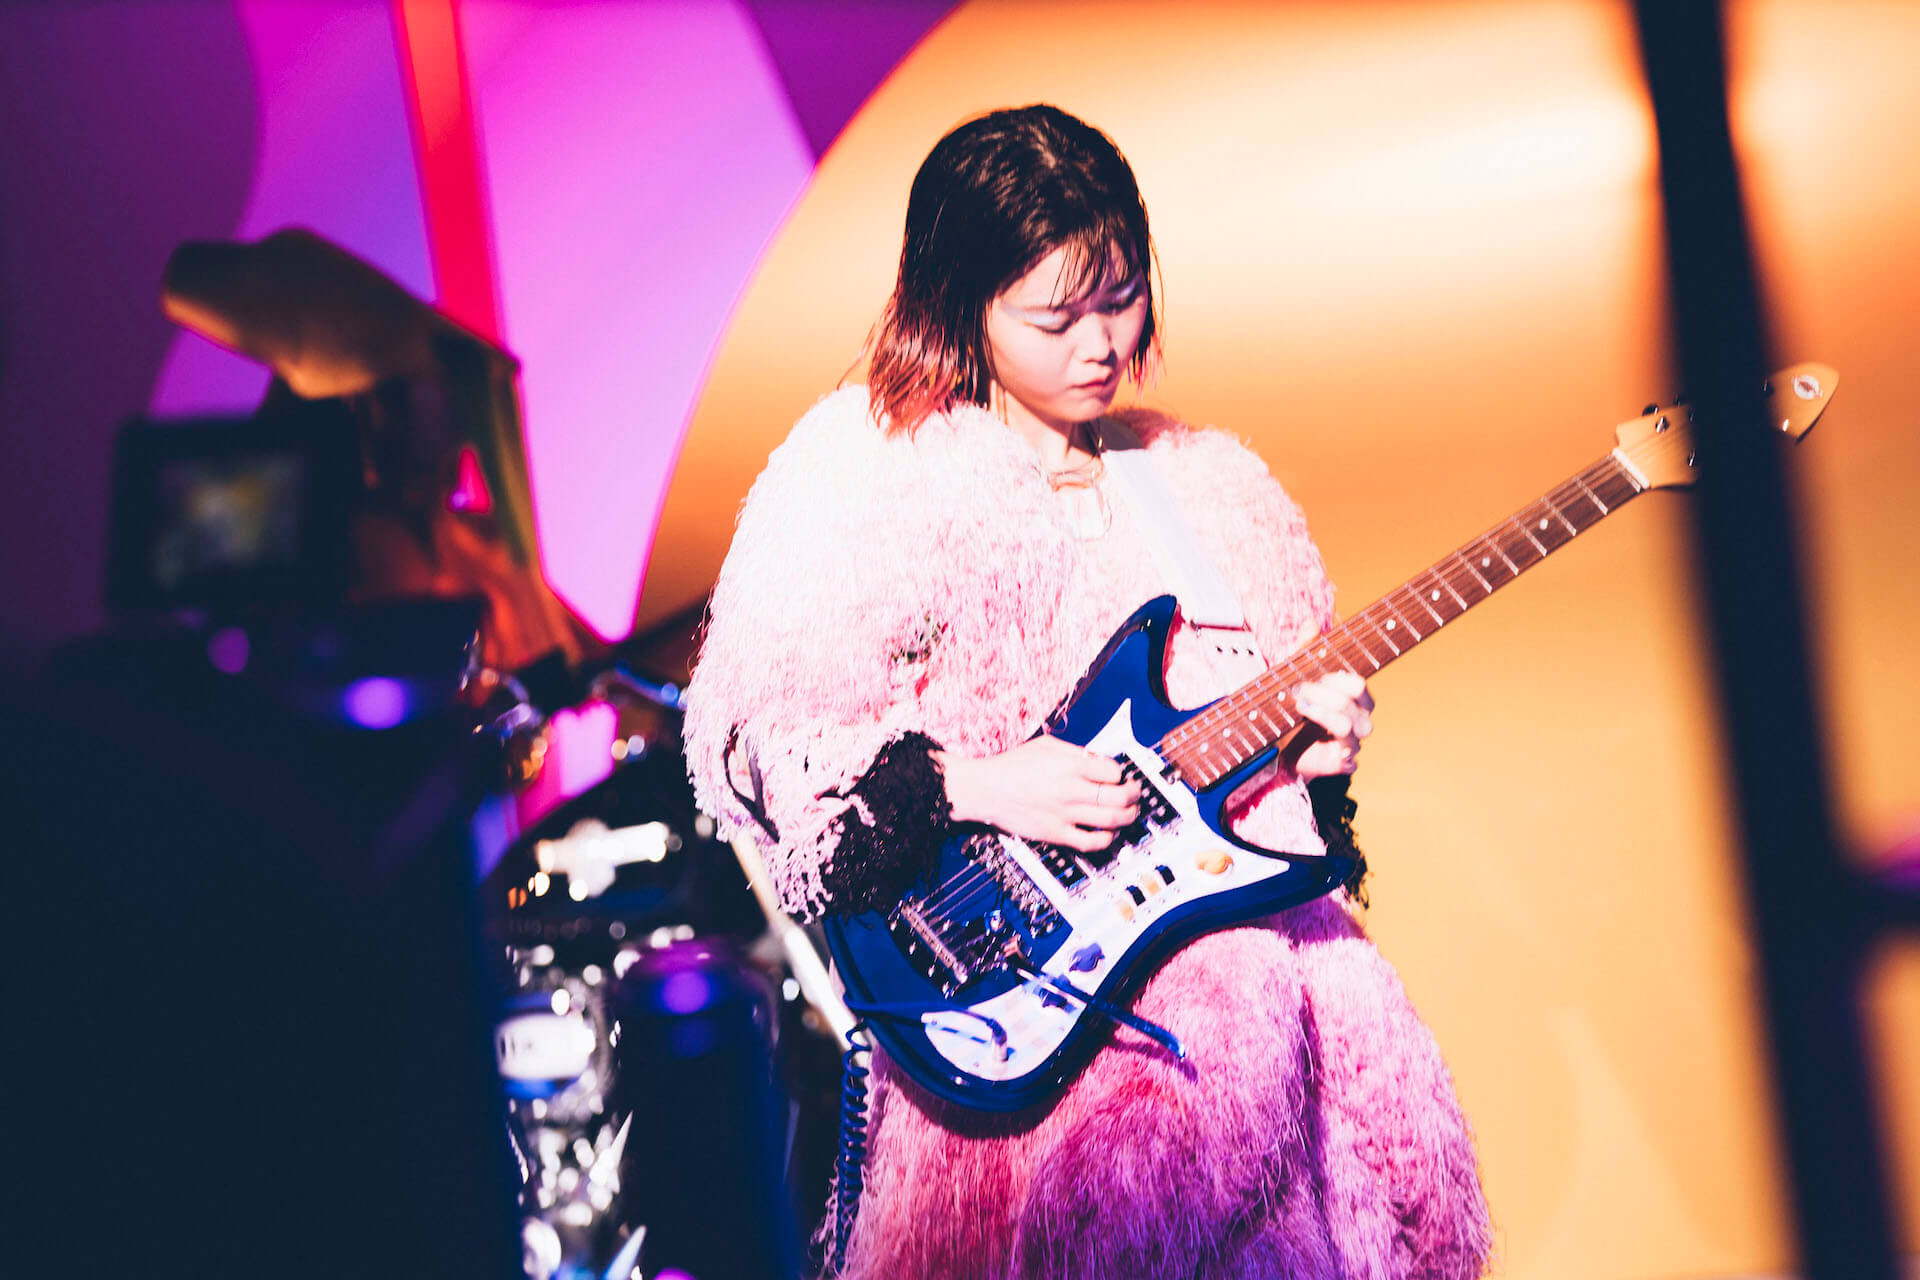 Reiの最新シングル「Territory Blues」配信開始&MVも完成!ハーレーダビッドソン × Rei によるコラボ・プロジェクト<SEEK for SOUL>オリジナル楽曲 music190919-rei-harley-davidson-3